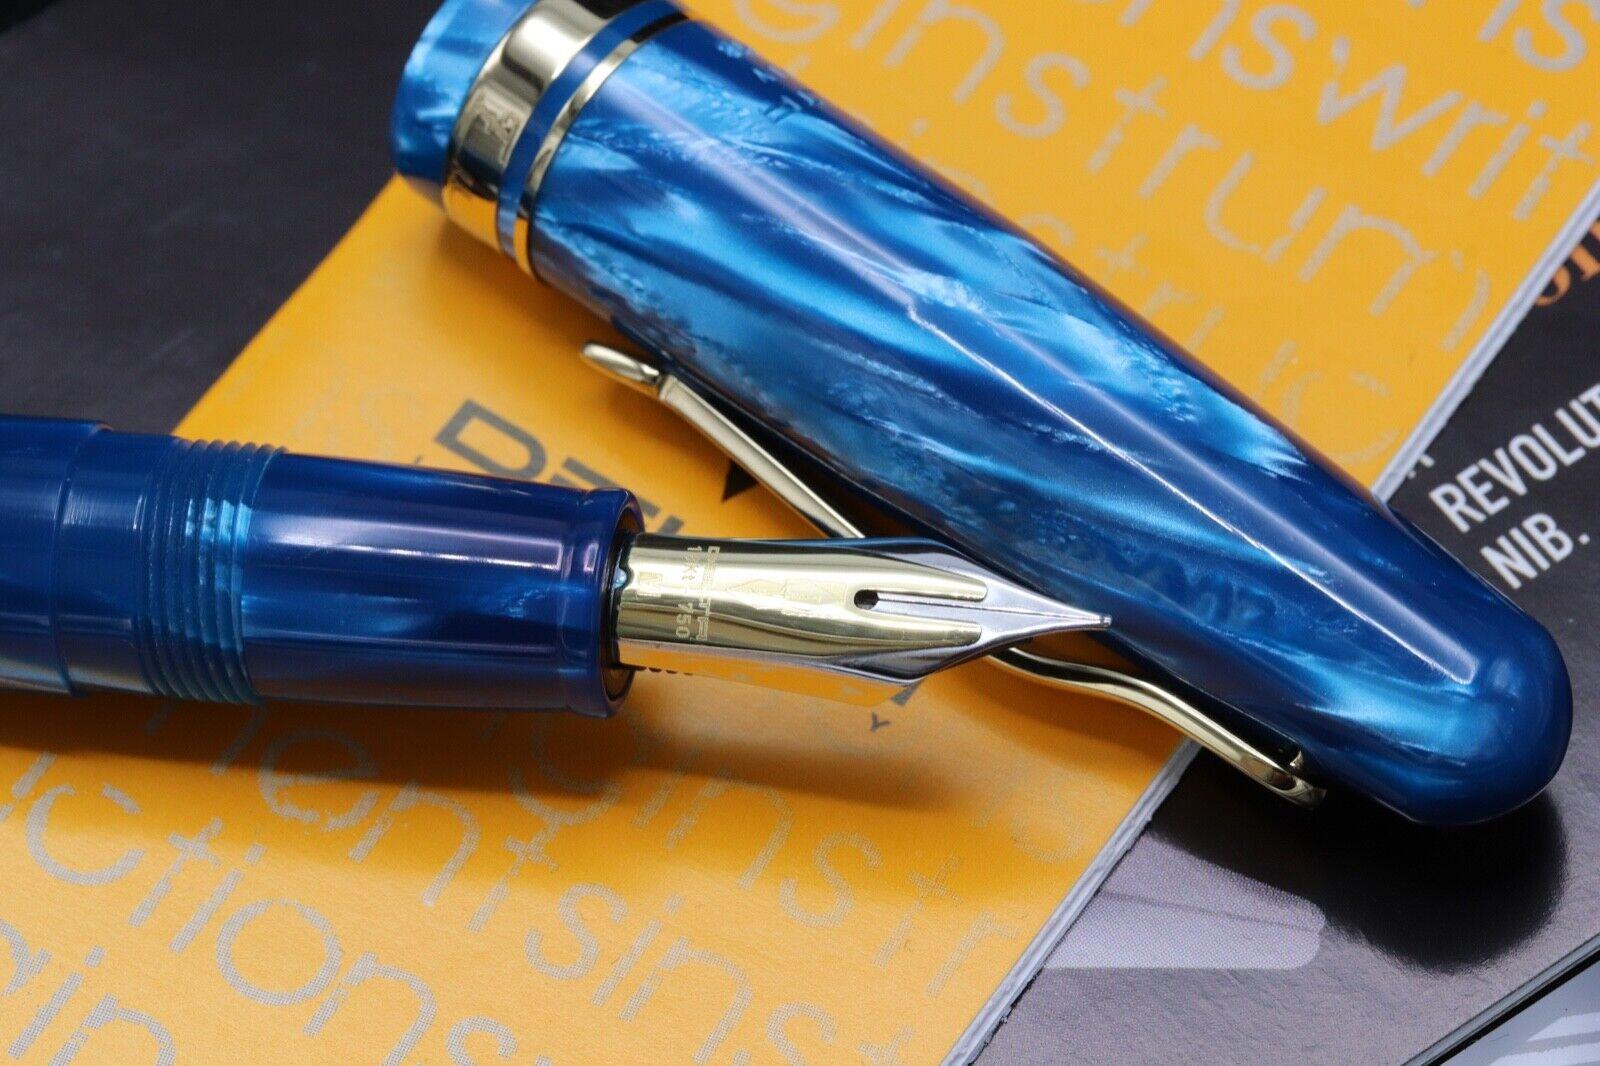 Delta Fusion 82 Limited Edition Turchese Celluloid Fountain Pen - 06/18 2